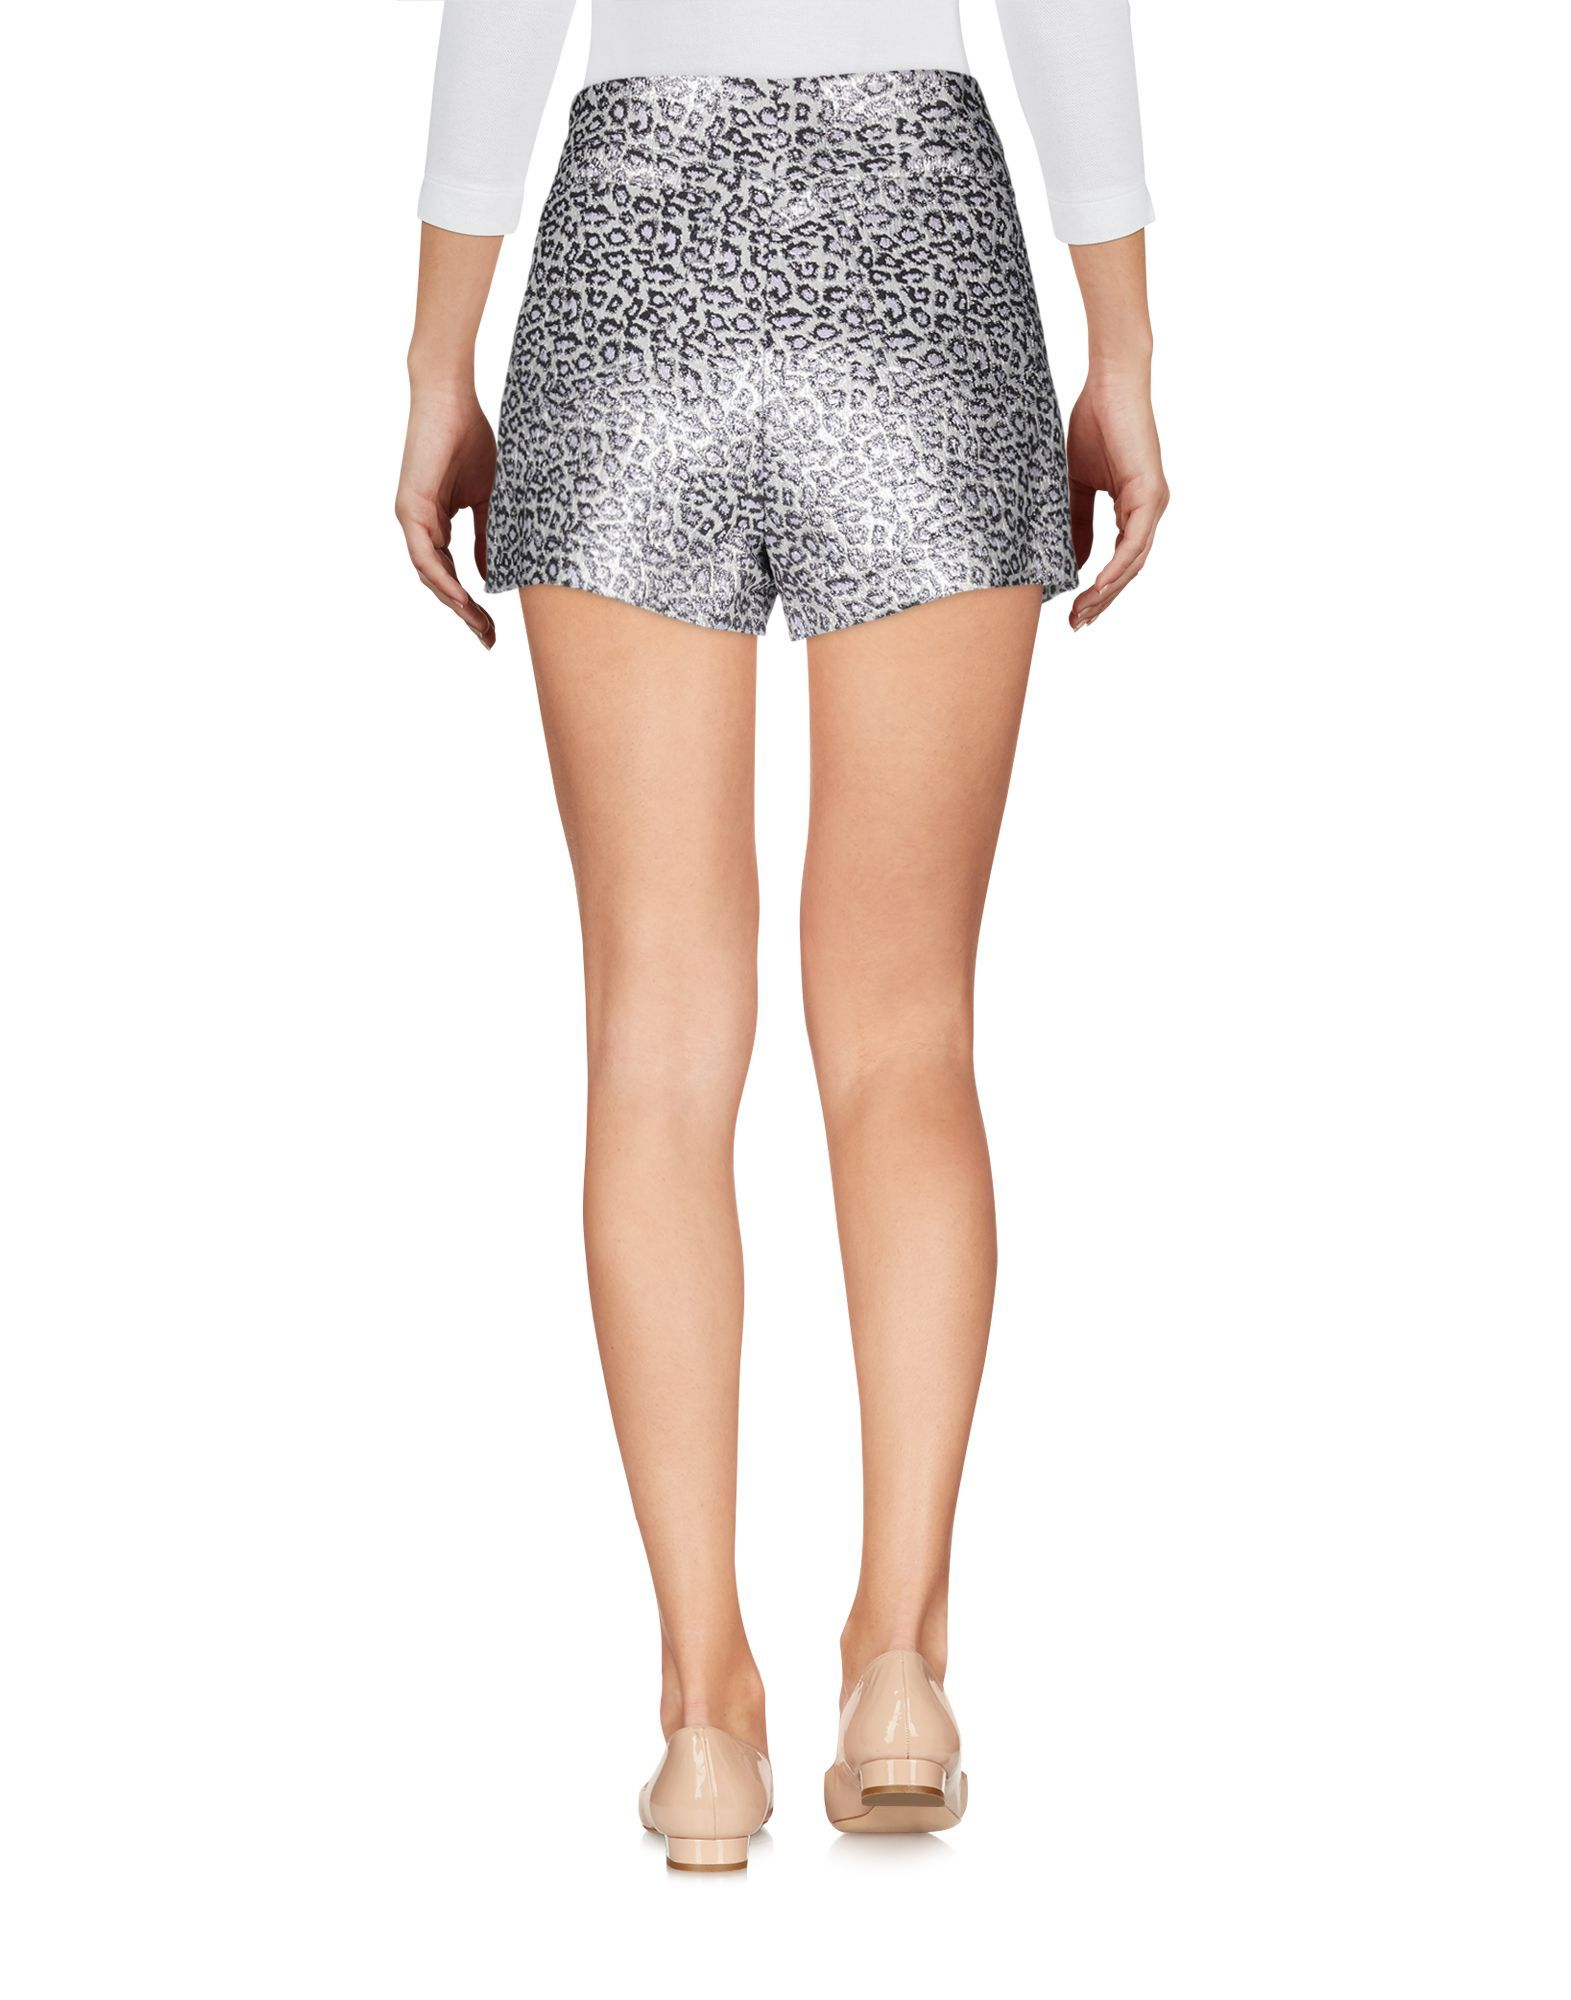 Giamba Ivory Jacquard Leopard Print High Waisted Shorts